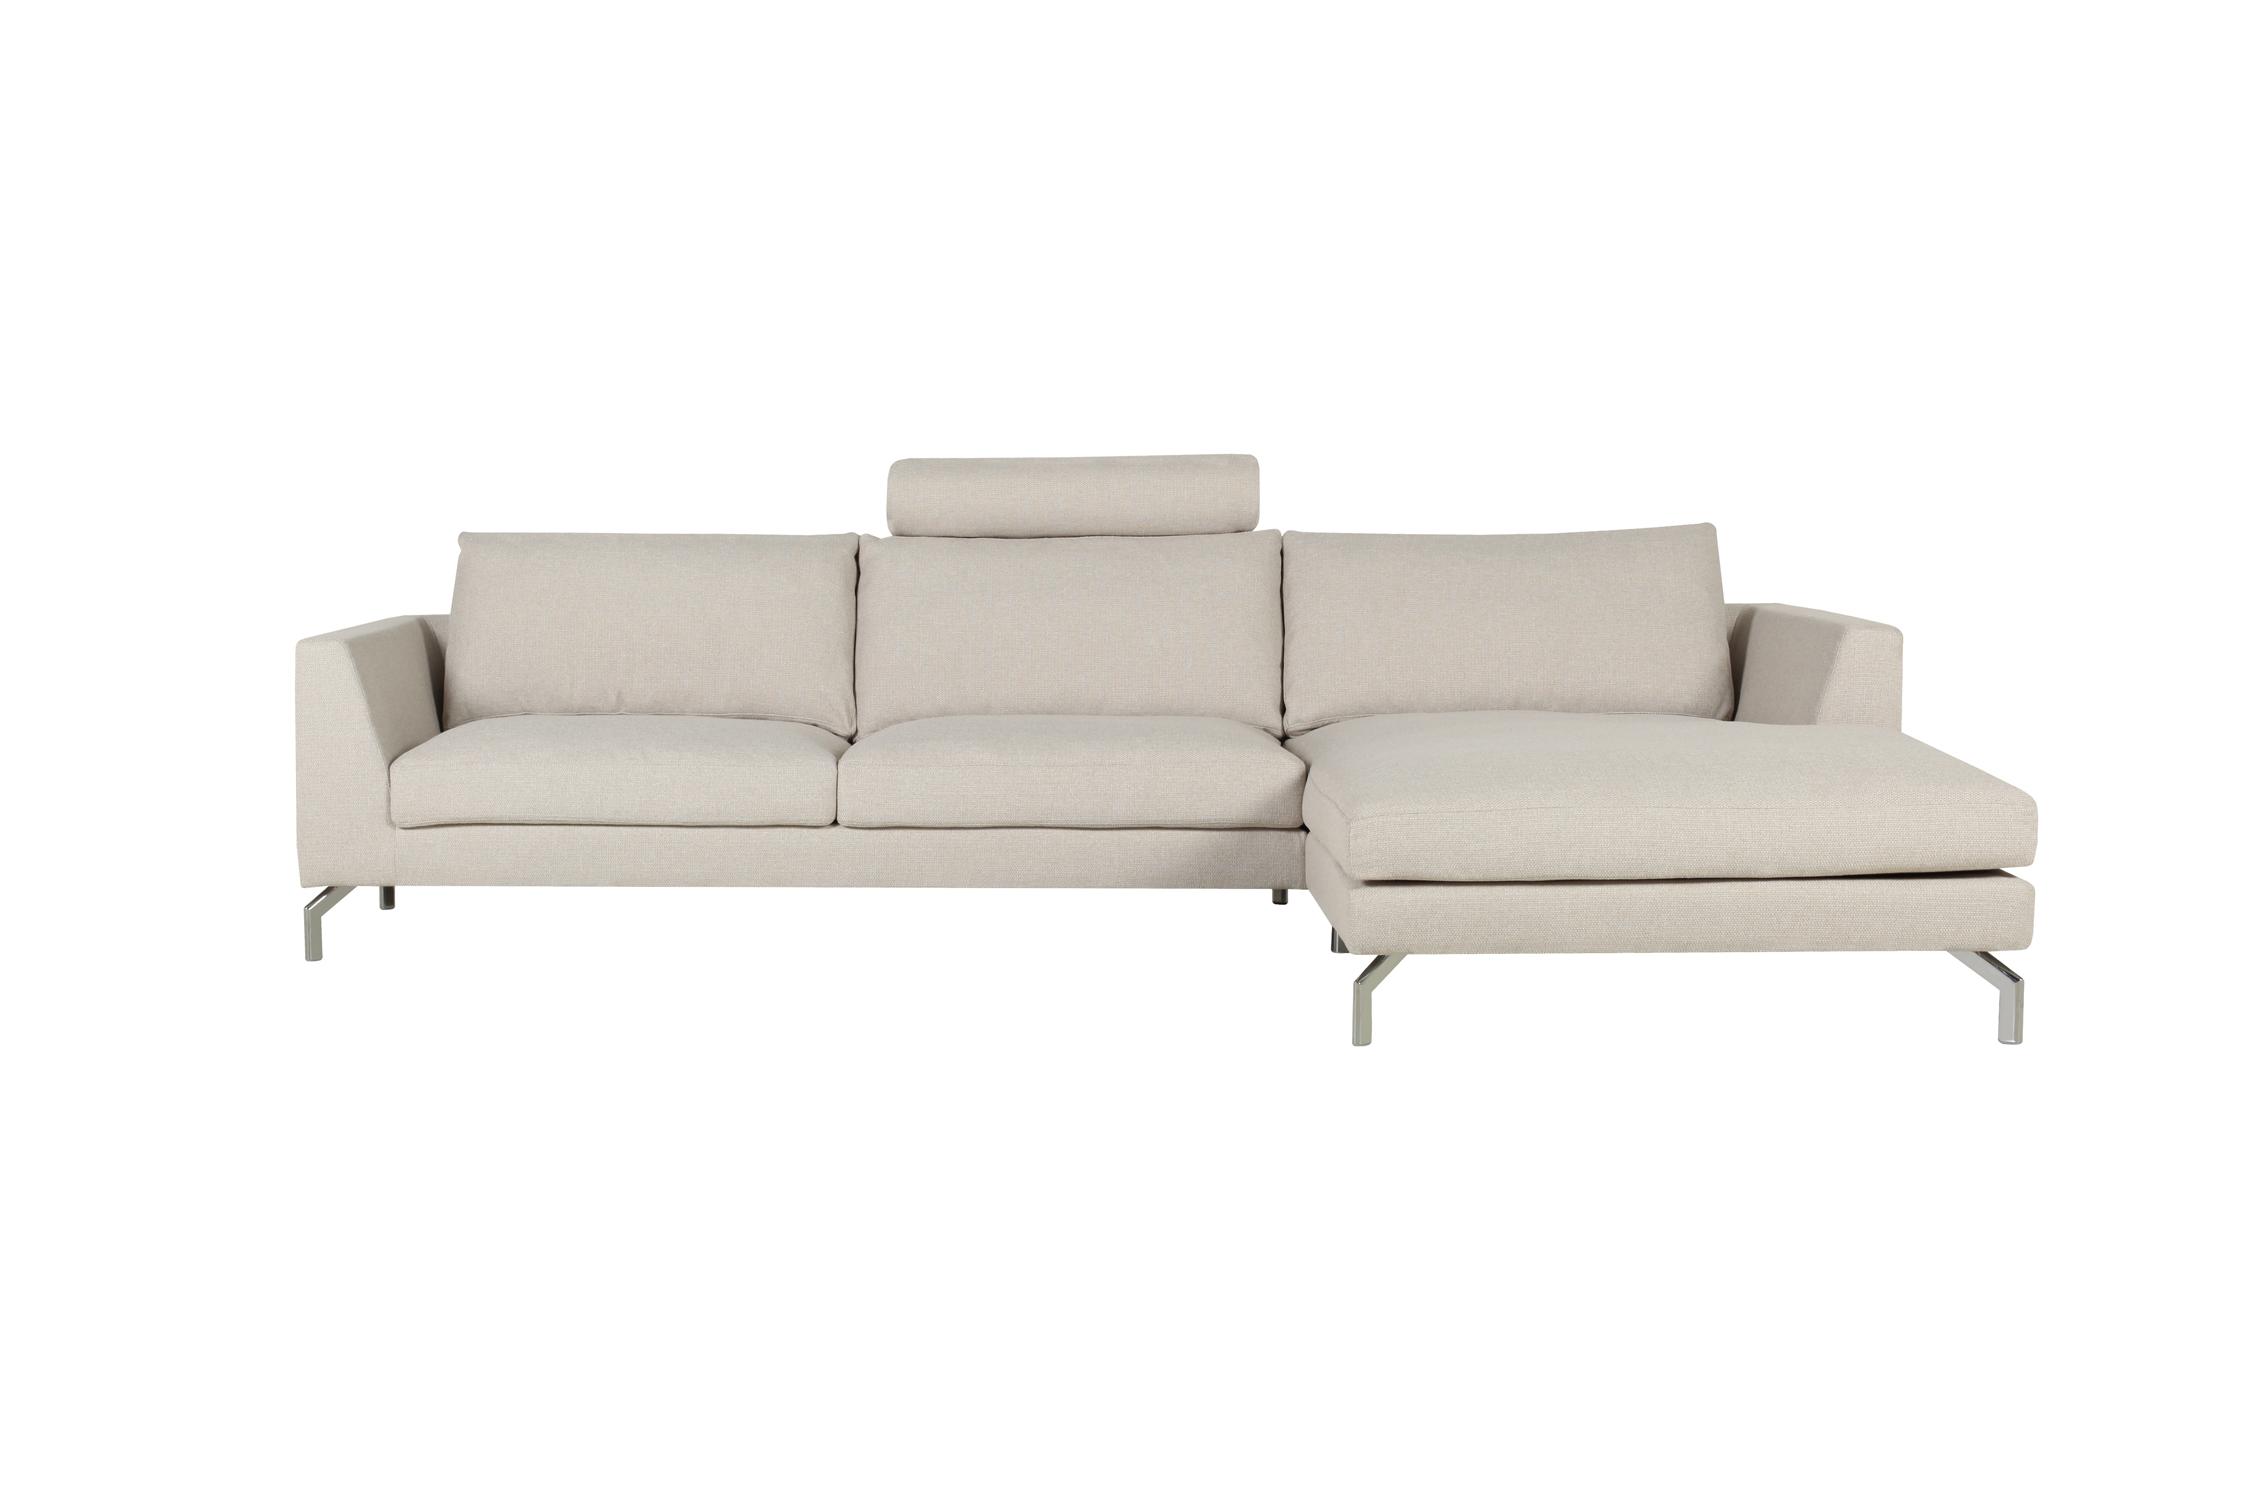 Allegra Set 1 Sofa With Chaiselongue-33211